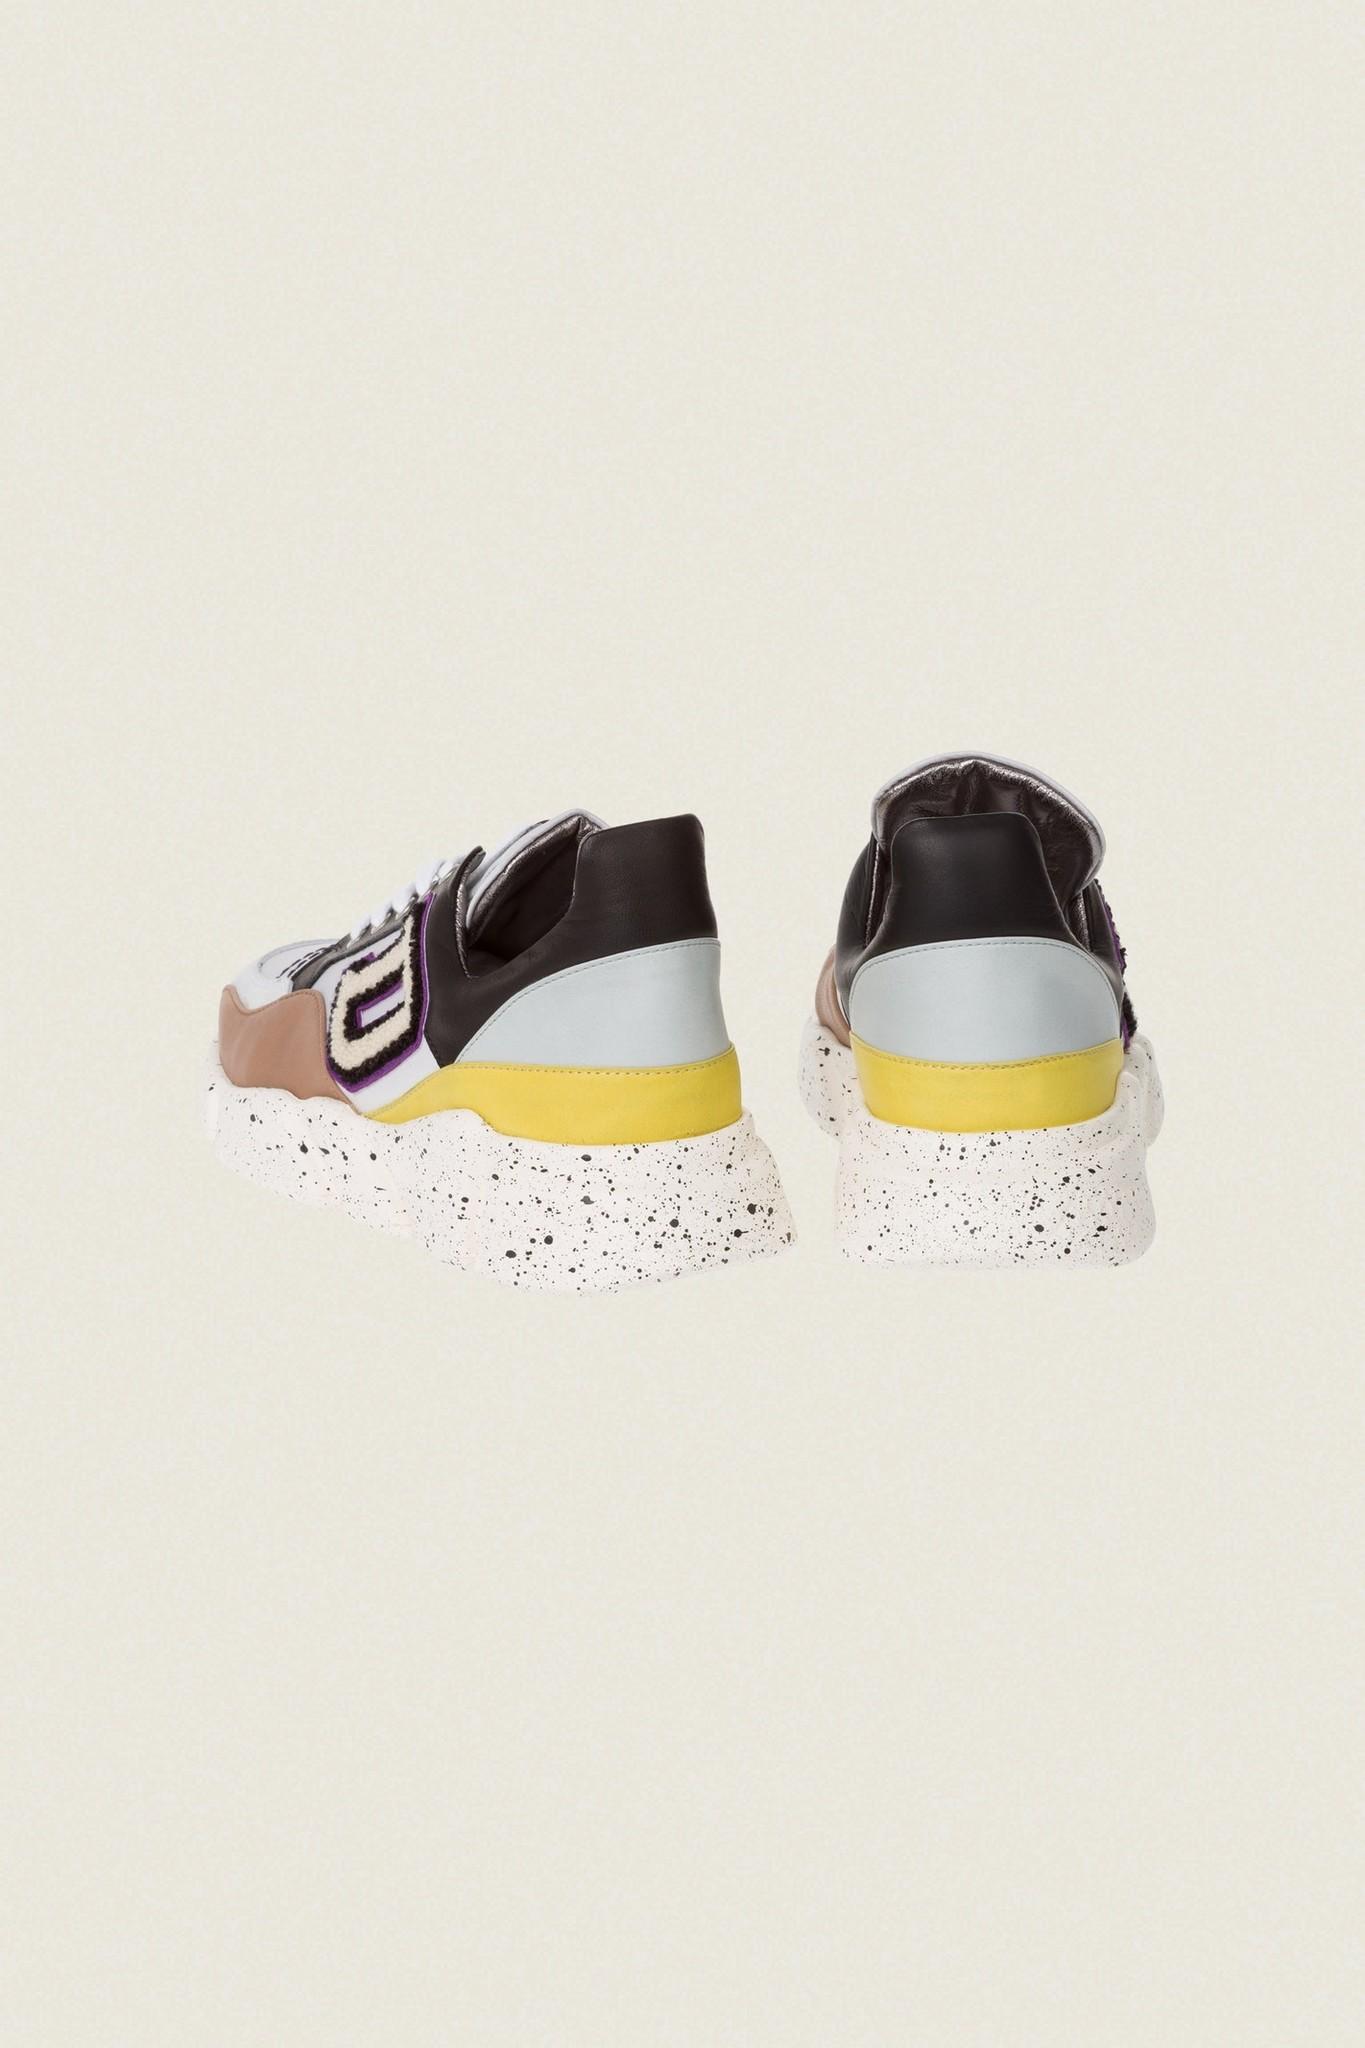 Patch Ambition D sneaker dorothee schumacher-7